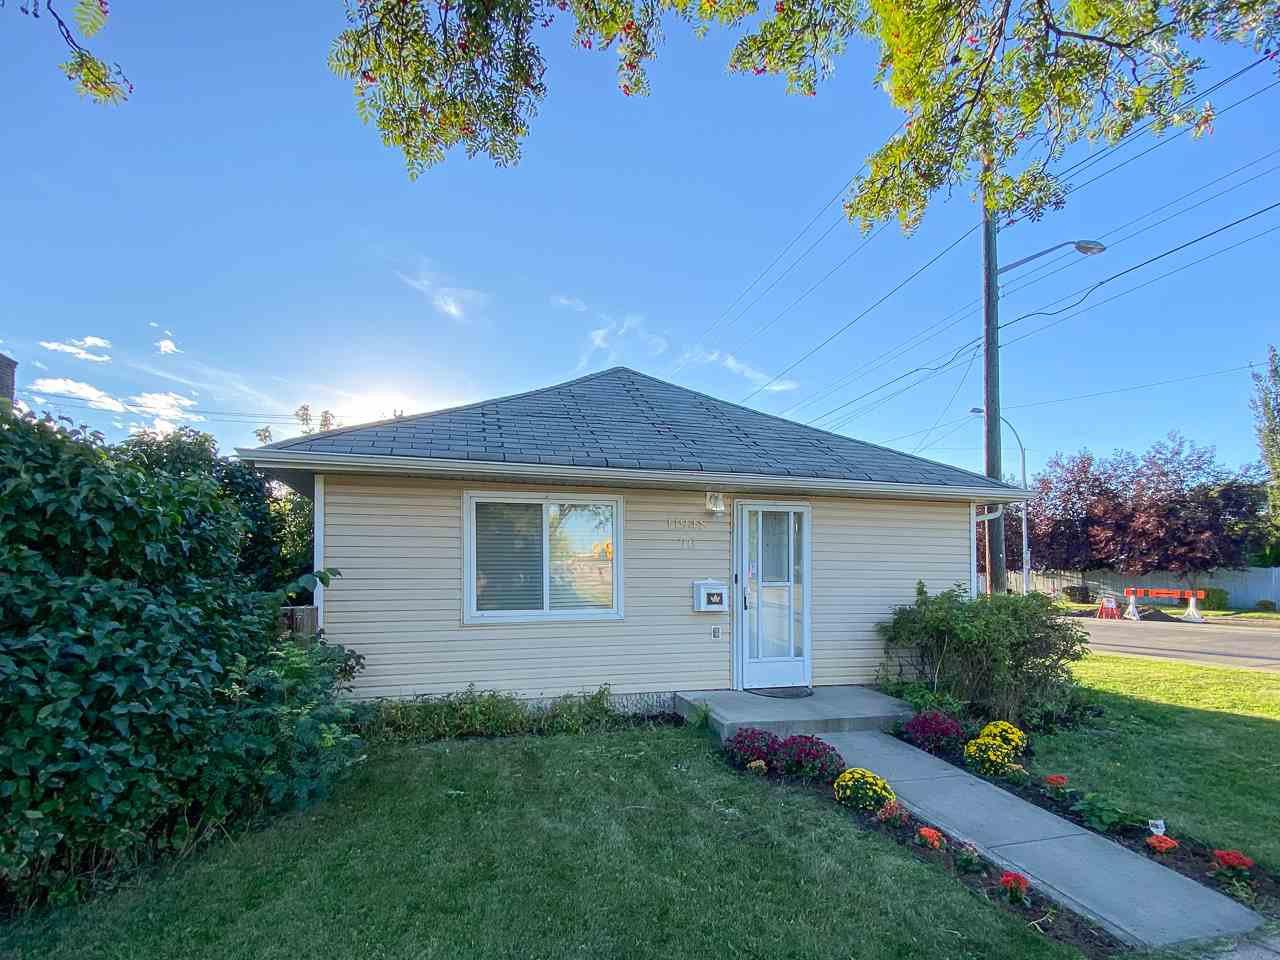 Main Photo: 11948 76 Street in Edmonton: Zone 05 House for sale : MLS®# E4221795